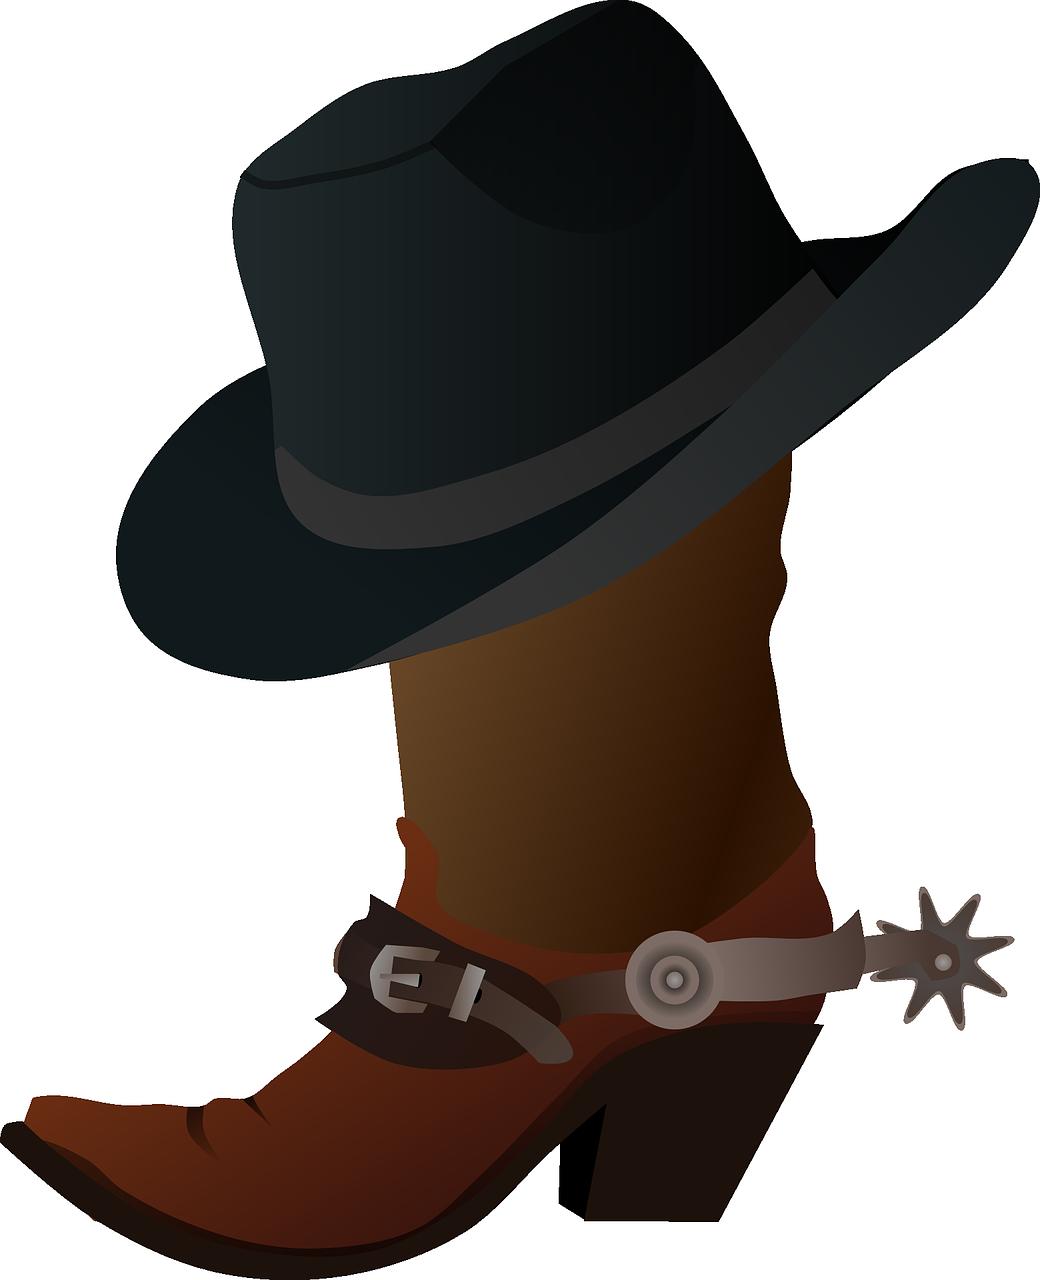 Western frontier clip art. Cowboy clipart west american